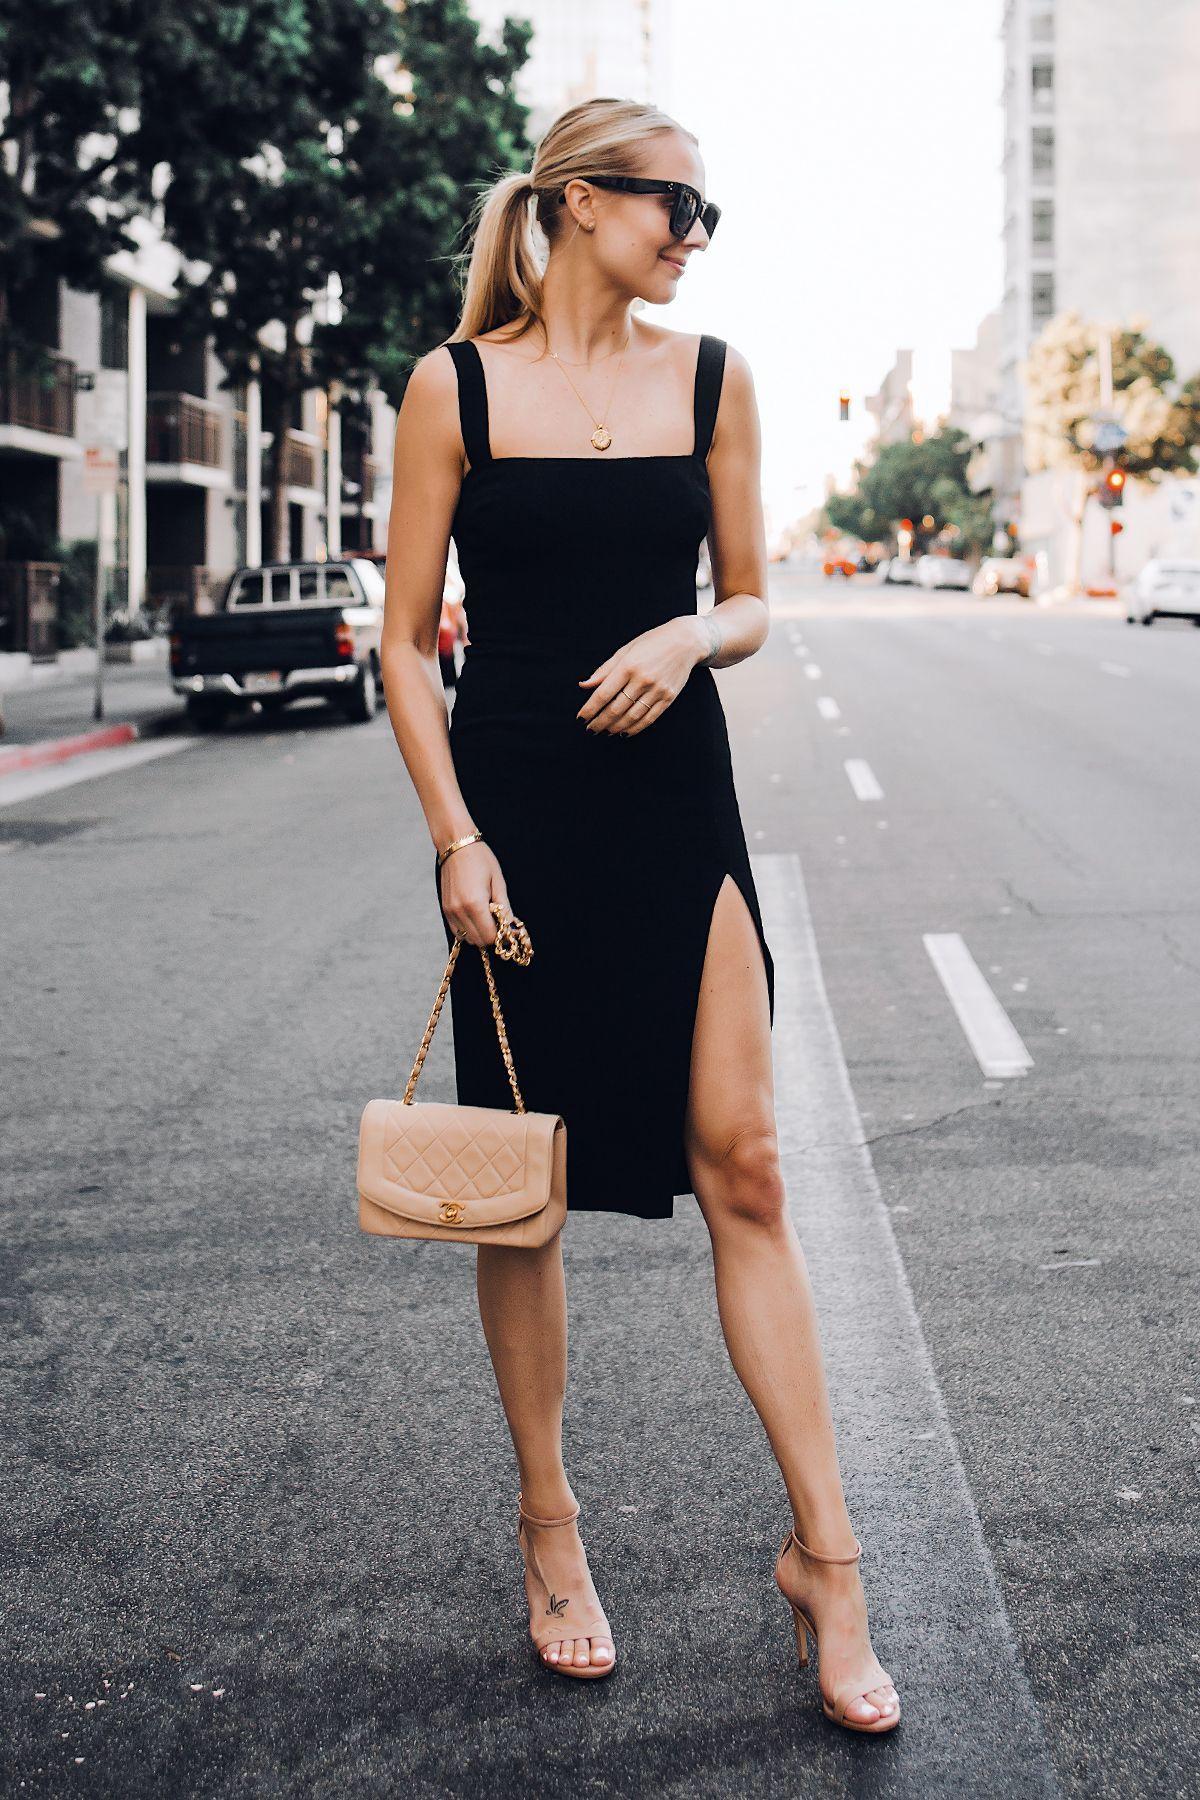 Blonde Woman Wearing Reformation Black Dress Tan Ankle Strap Heeled Sandals Chanel Tan Diana Handbag Gold Co Fashion Jackson Womens Fashion Black Women Fashion [ 1800 x 1200 Pixel ]